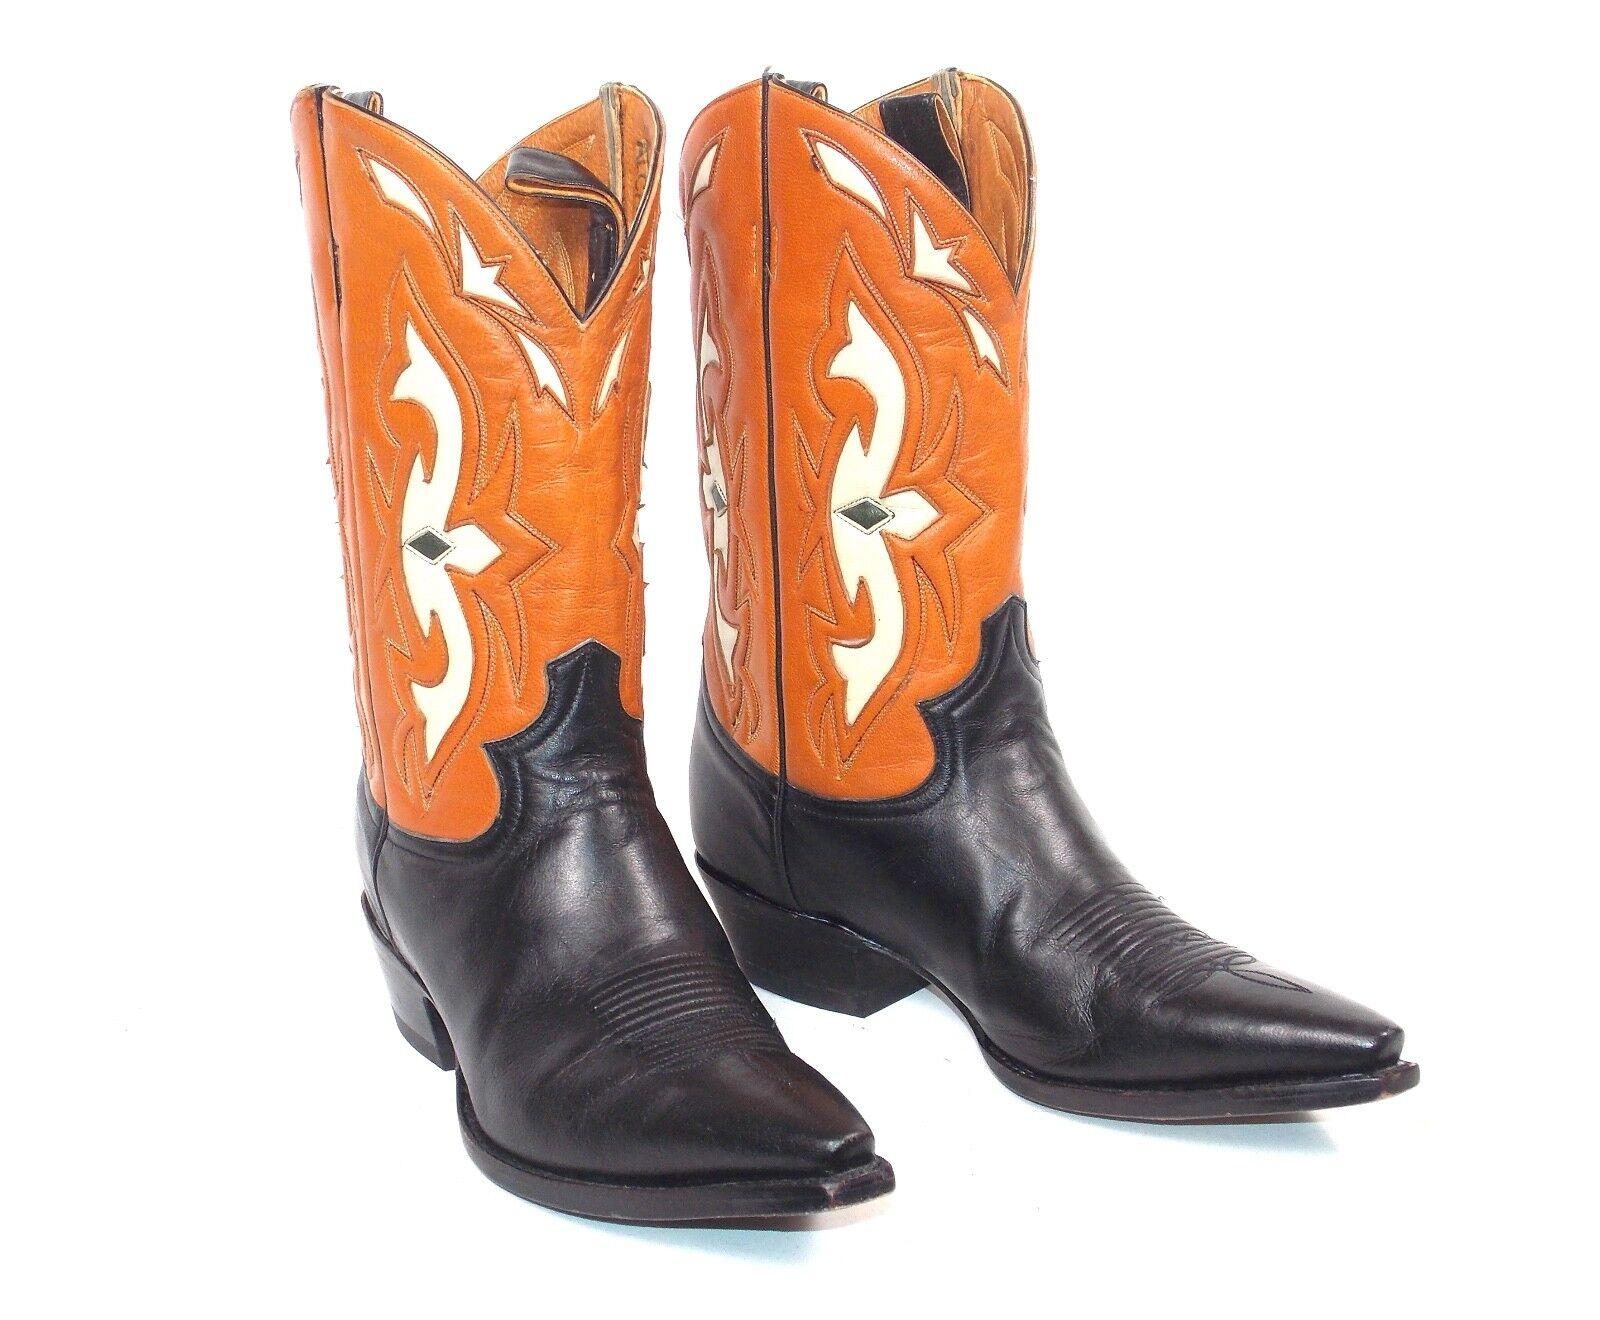 Justin Braun Tan Inlaid Cowboy Stiefel - Wmns Wee Size 9B Cutout Pee Wee Wmns Worn Twice 77e2eb